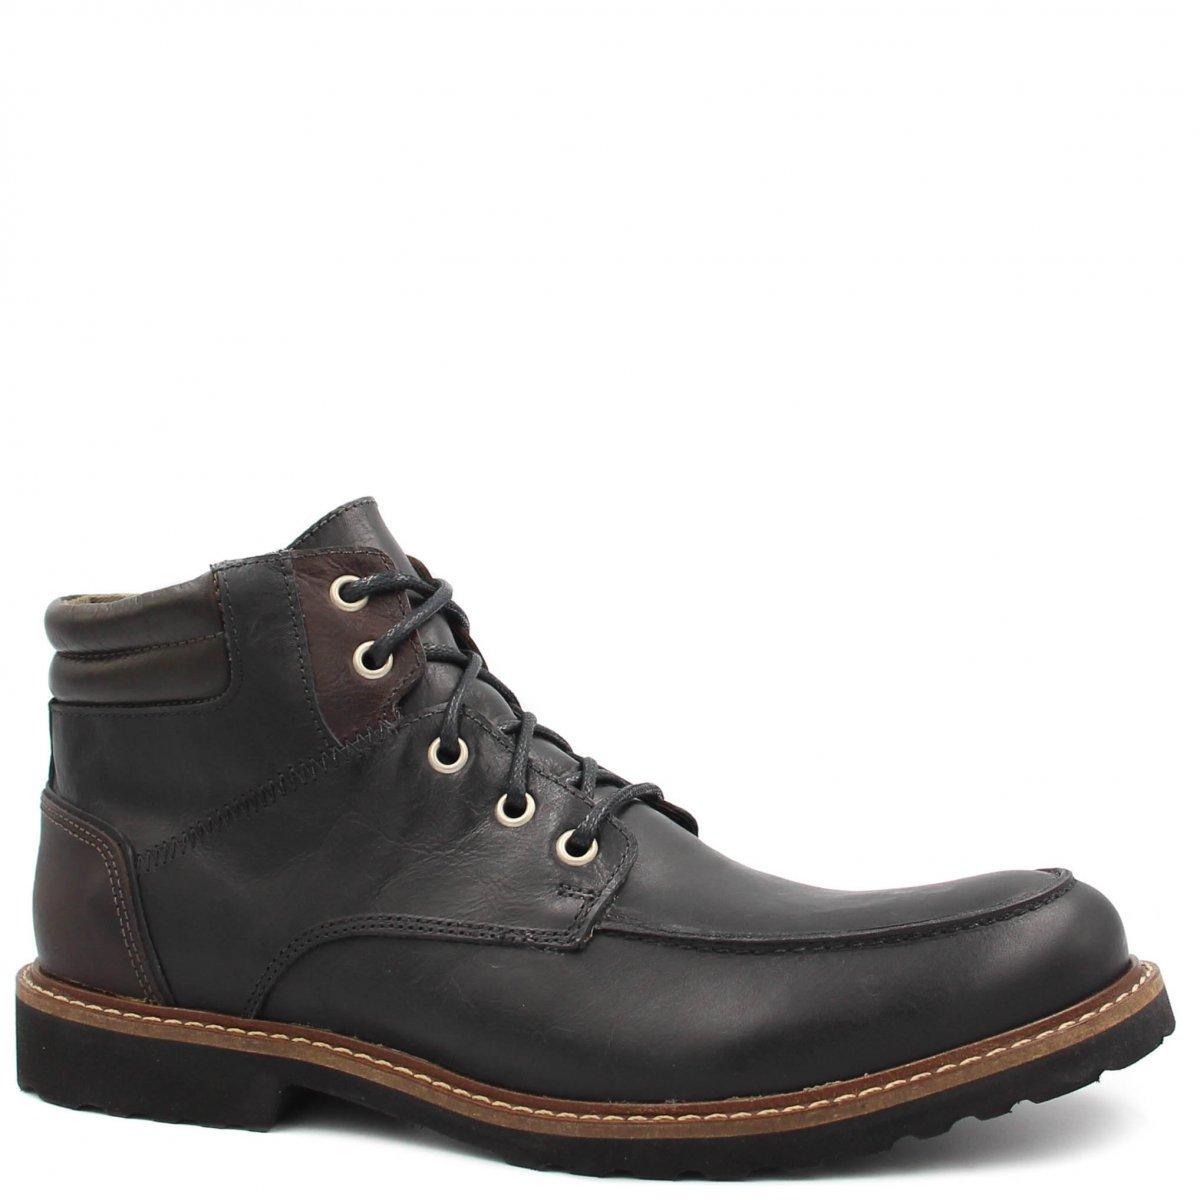 Bota Masculina Preto Couro Coturno Bota Coturno em Shoes Shoes Zariff Zariff RZw4qHPR